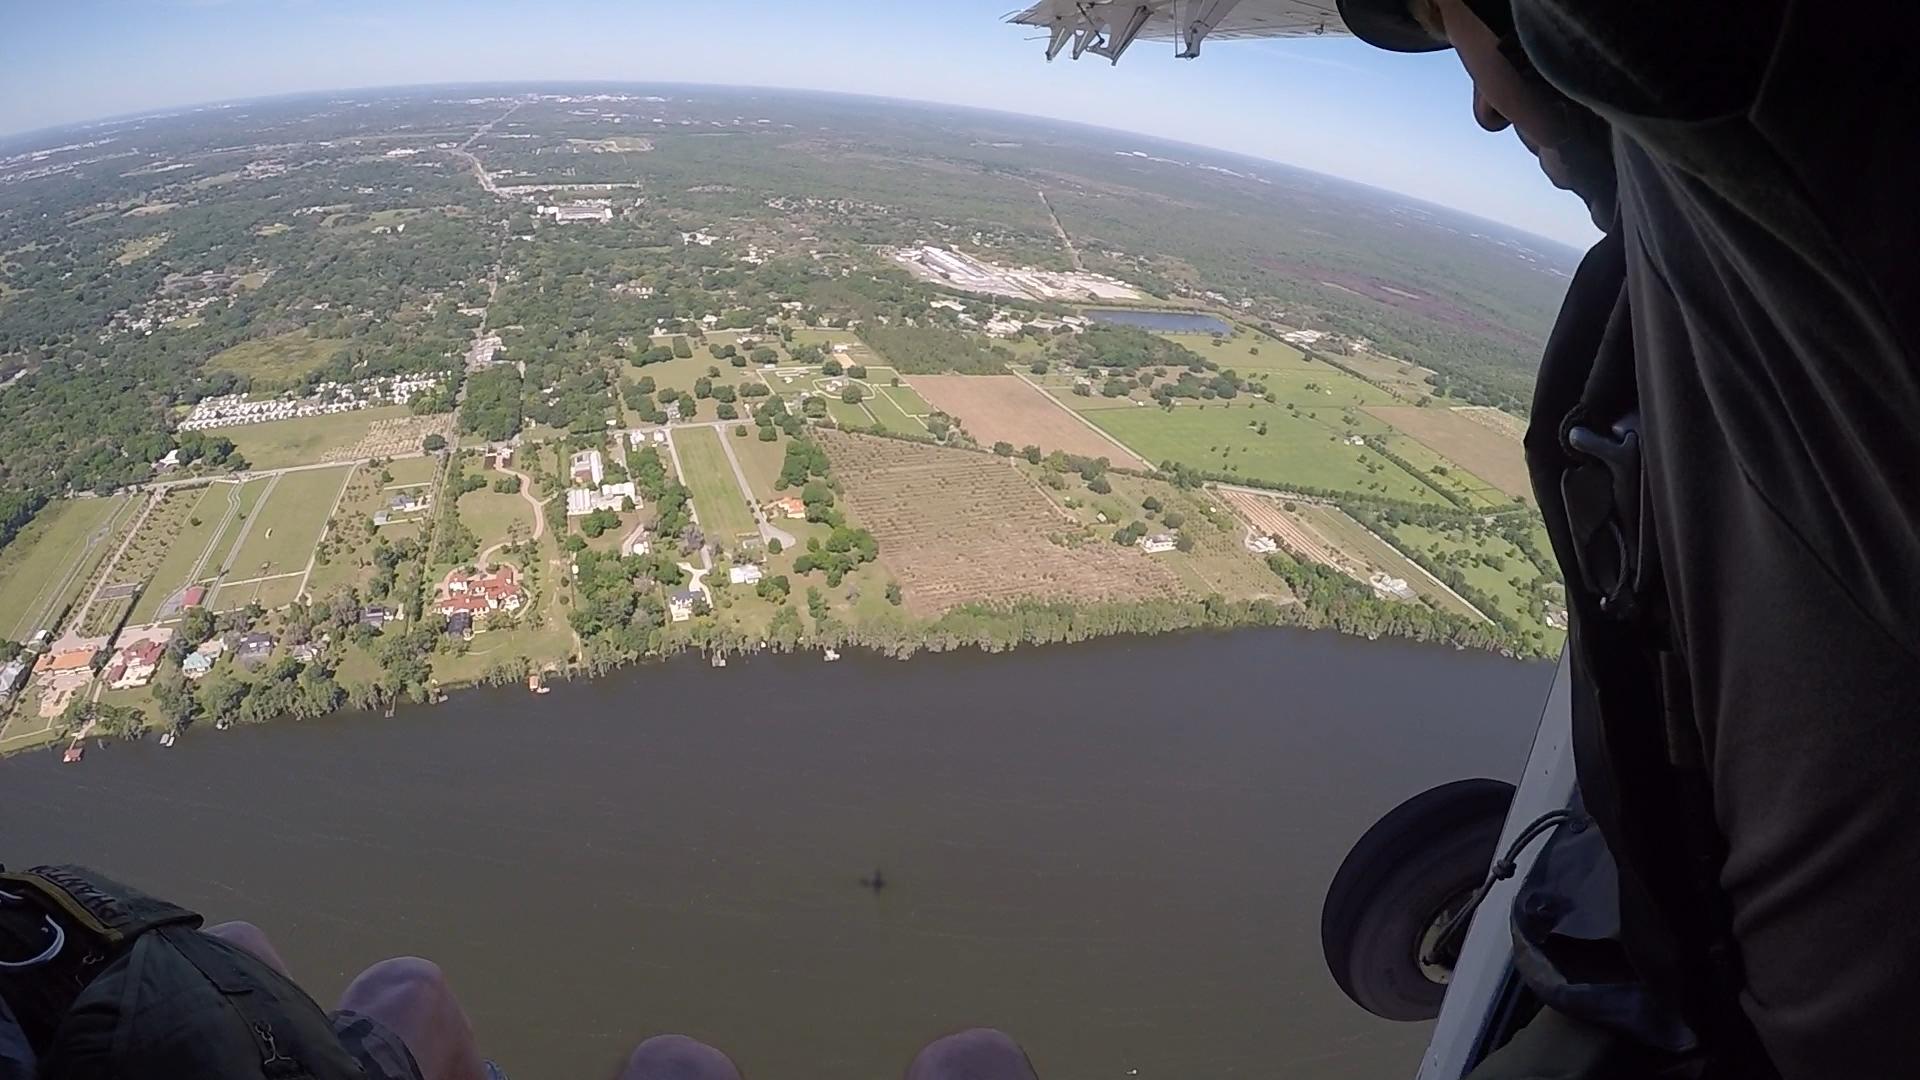 Airborne - 160409 - West side of lake.jpg